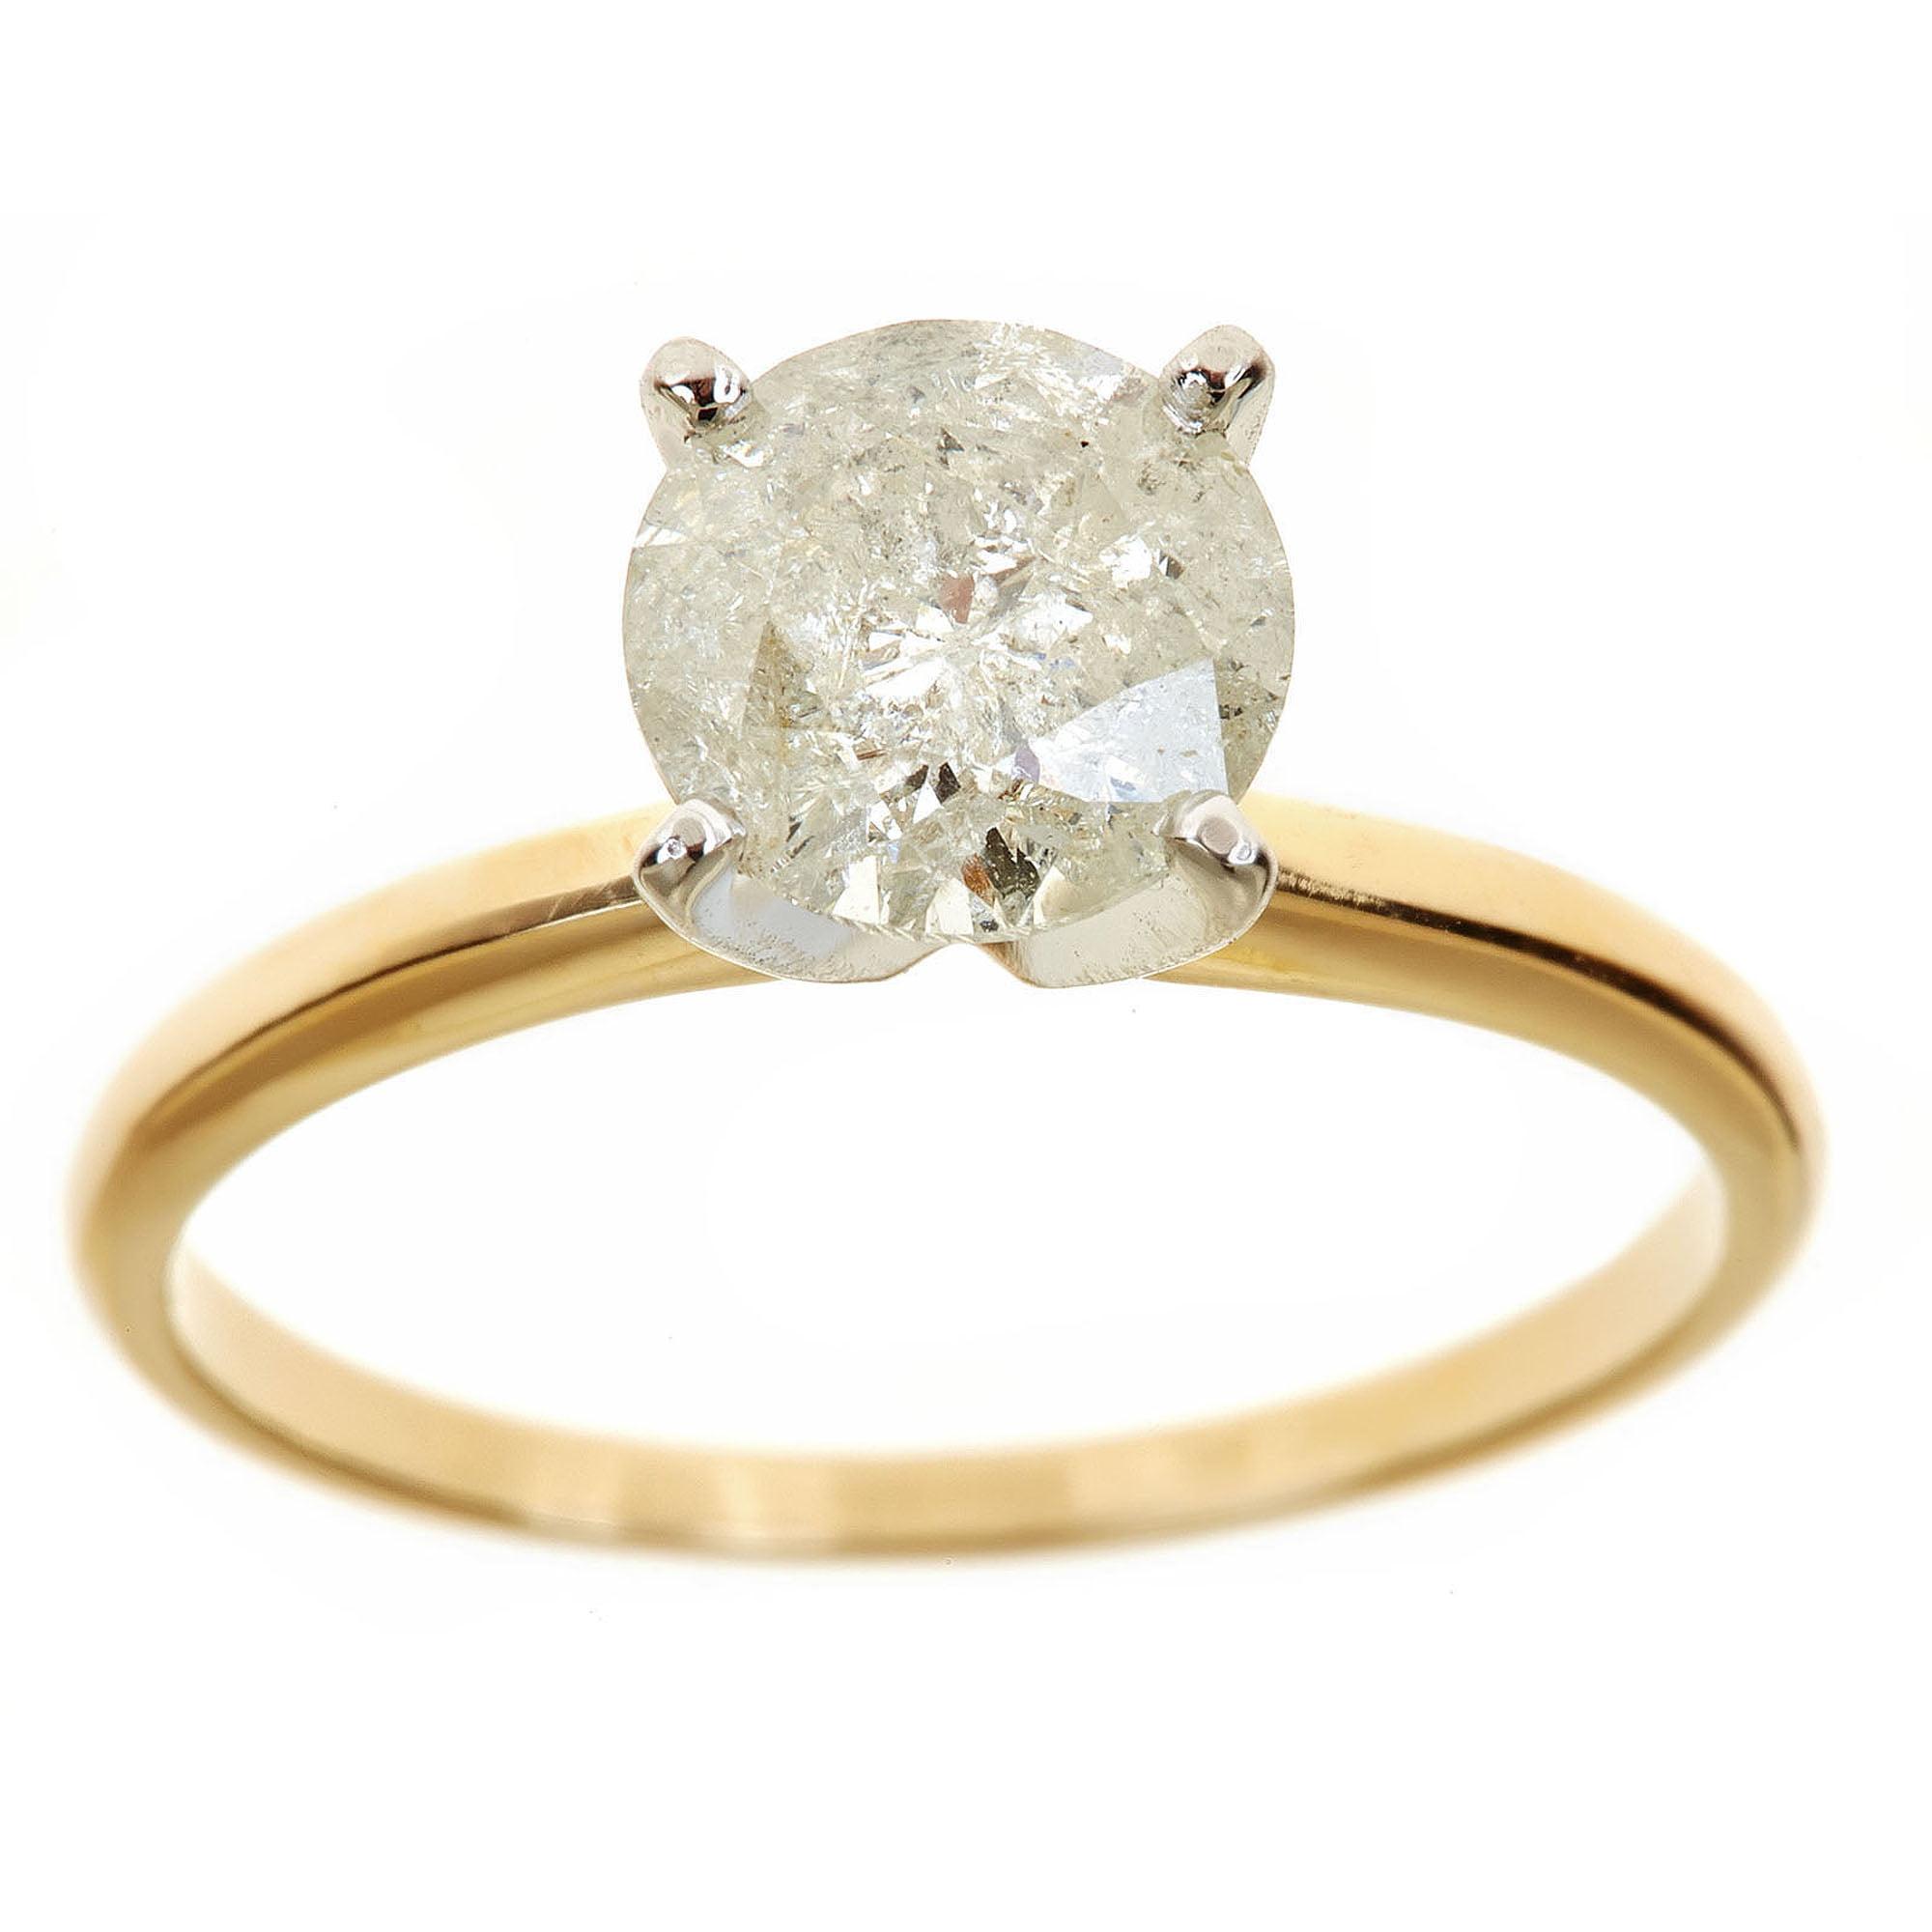 2 carat princess cut solitaire diamond rings  eBay